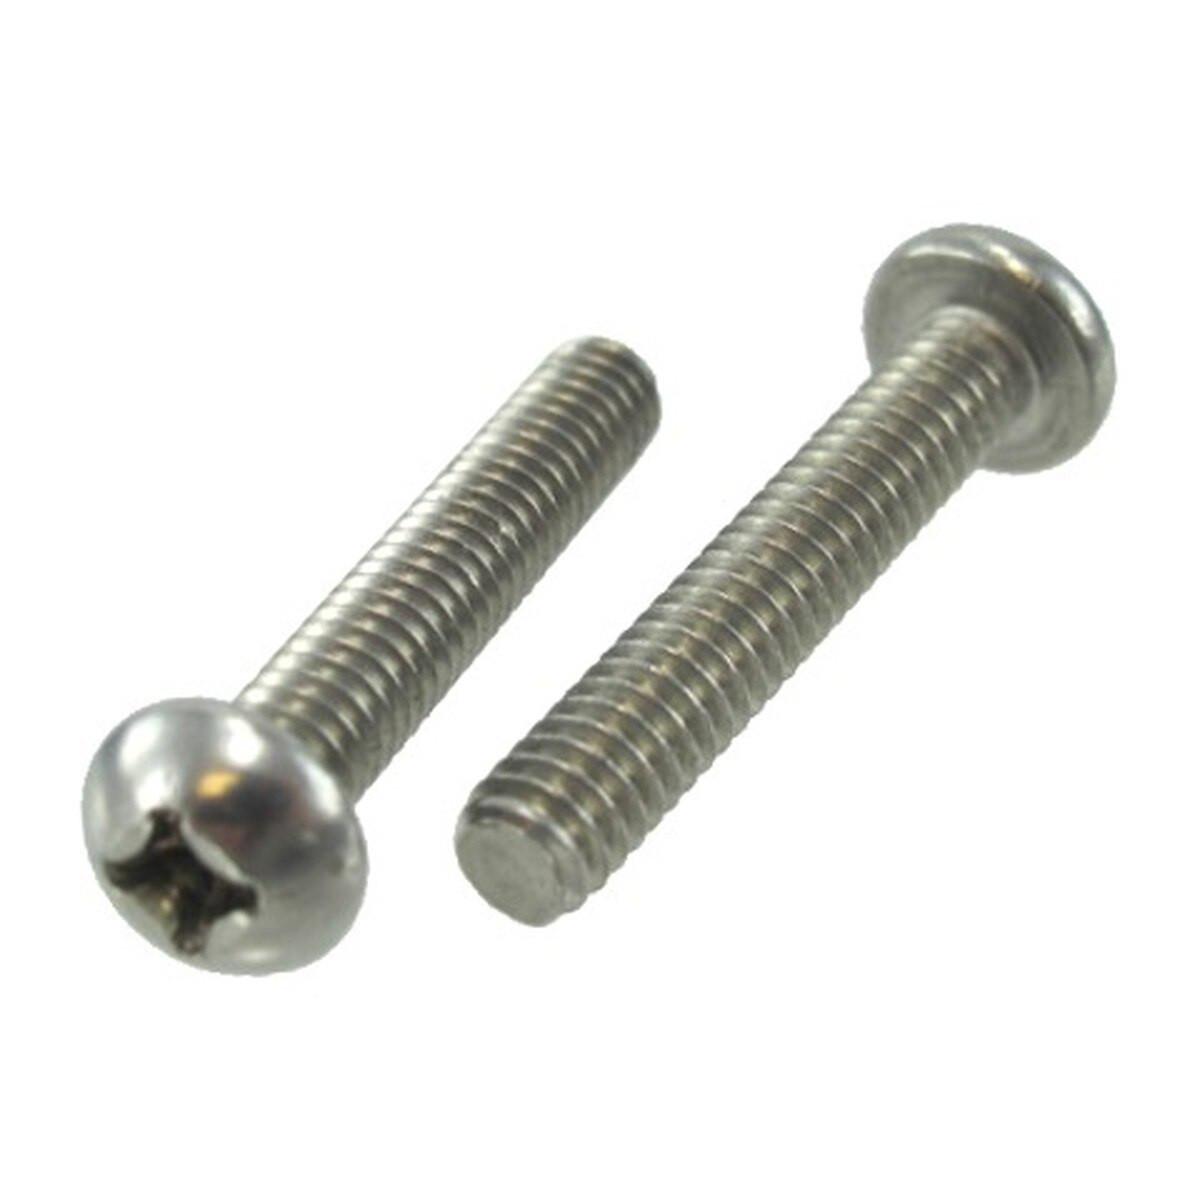 1//4-20 x 2-1//2 Round Head Phillips Machine Screw 100 pk.